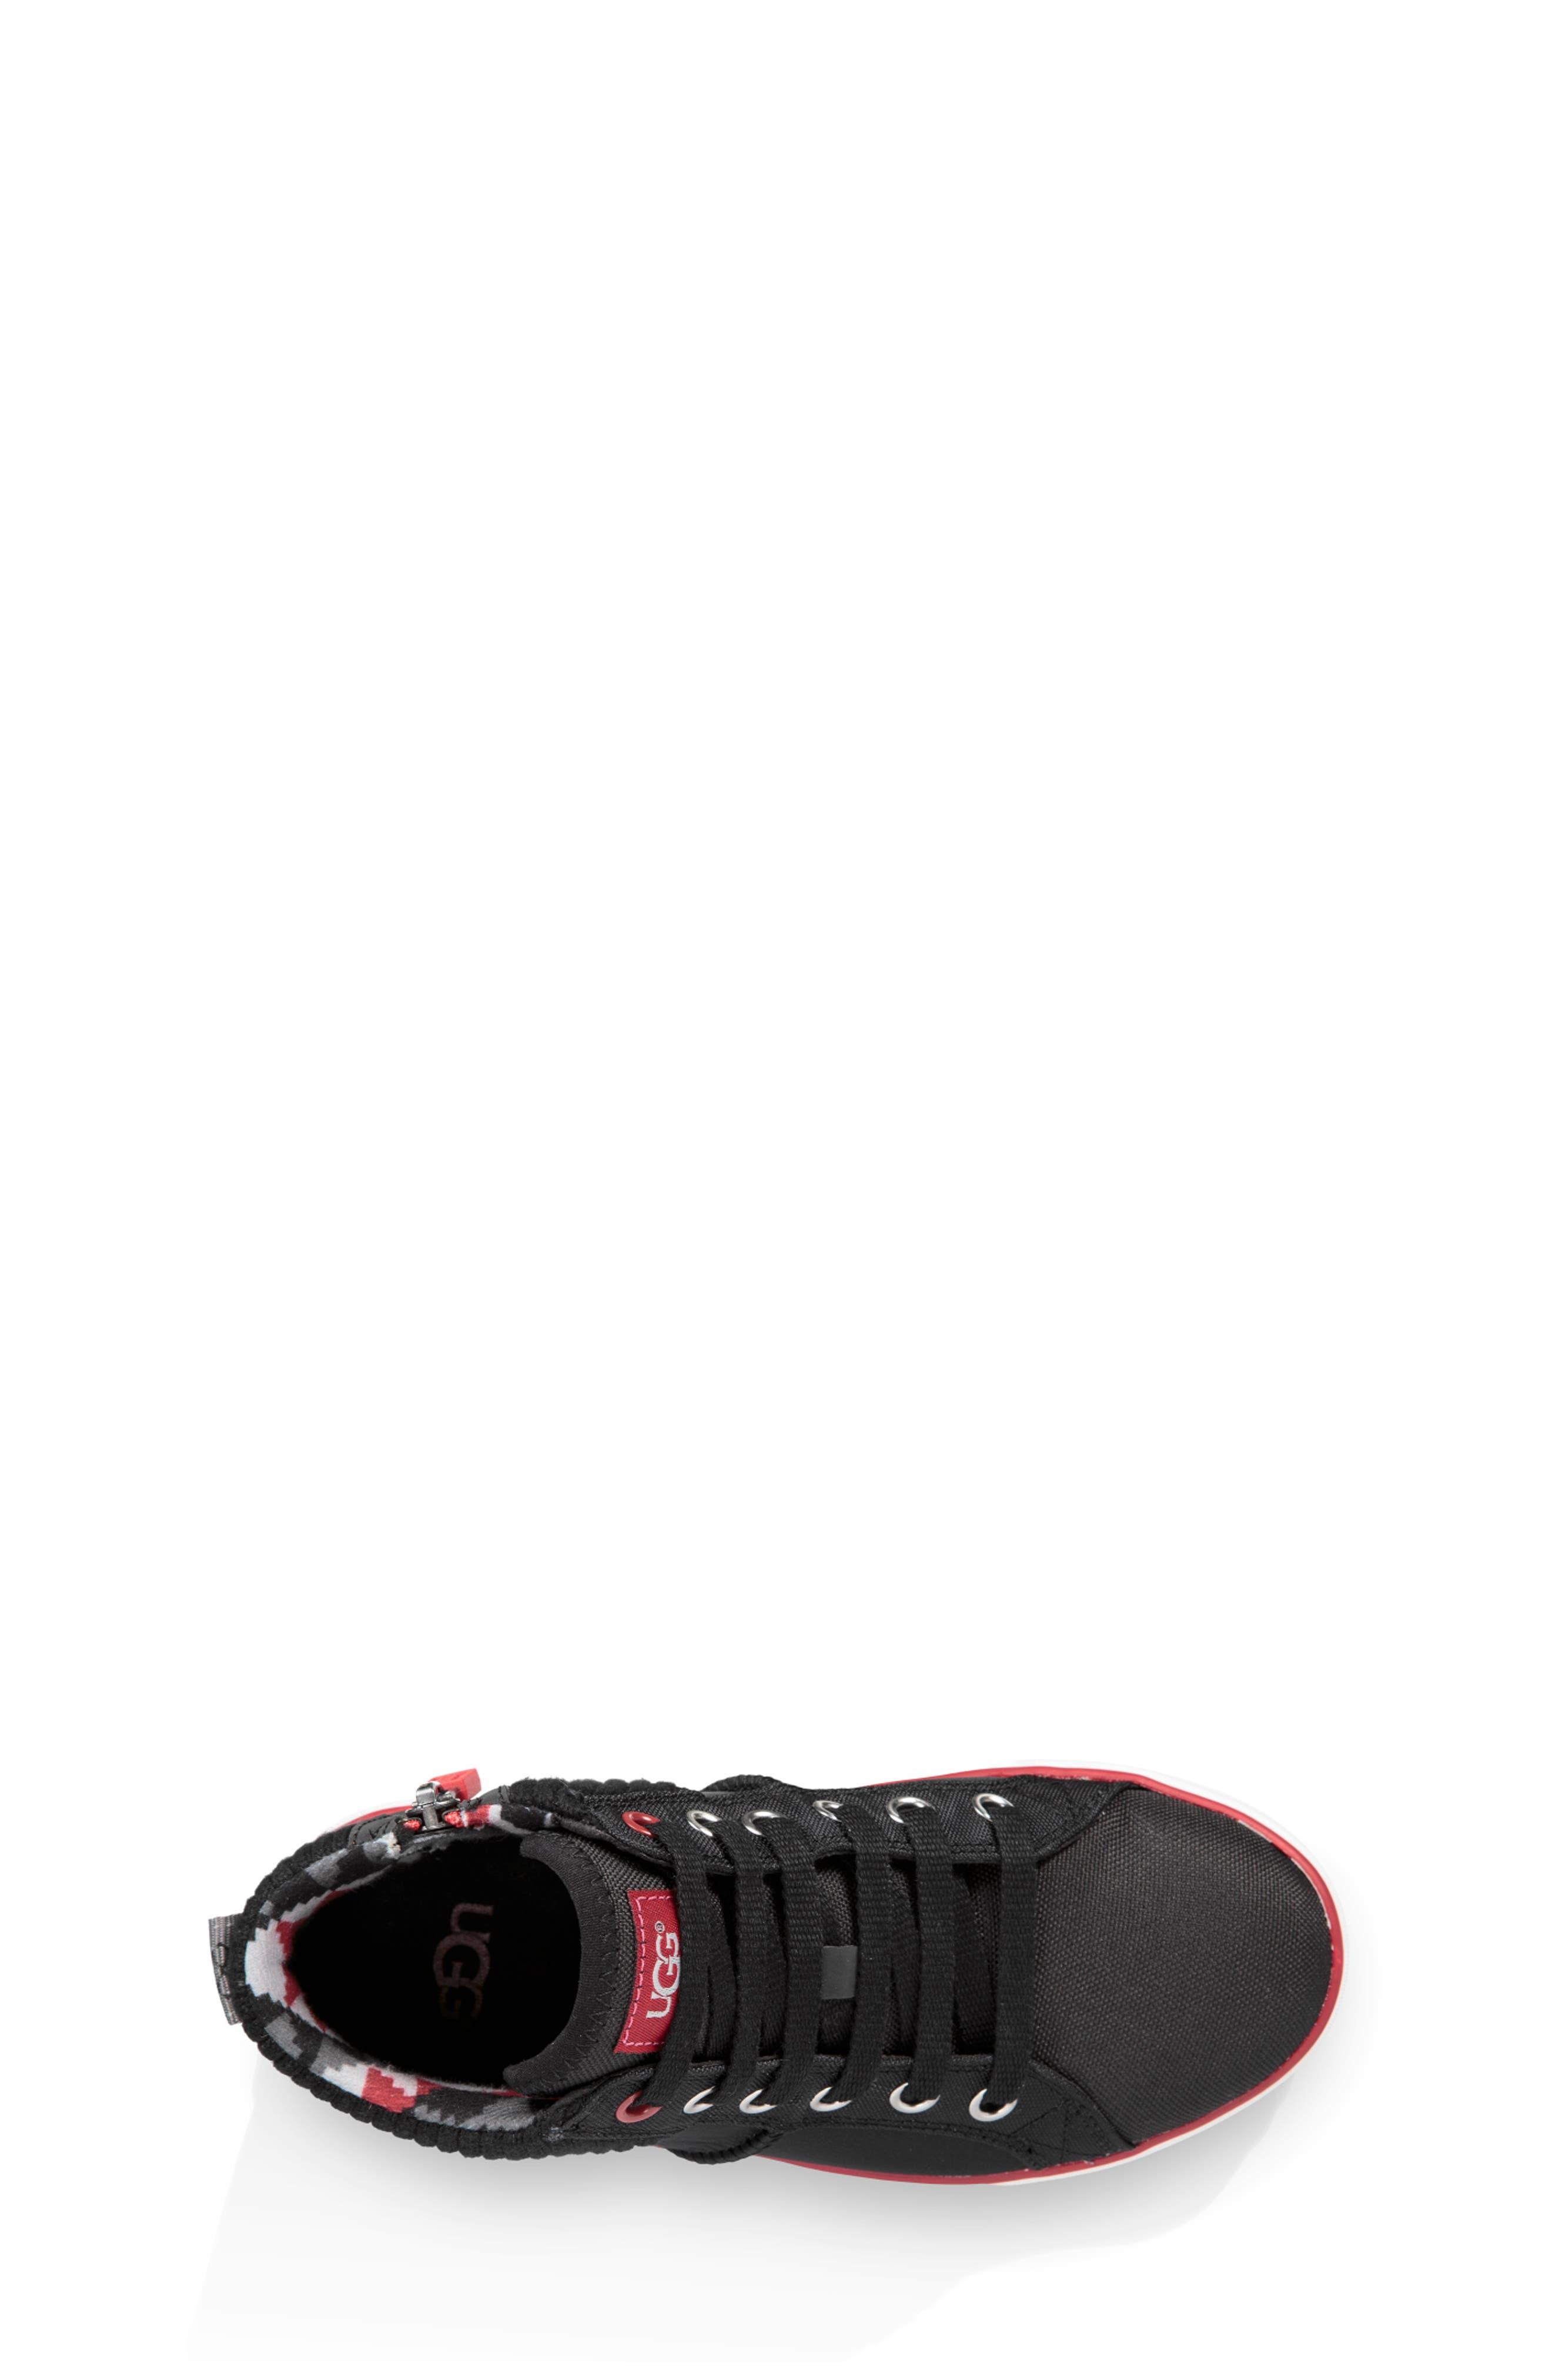 UGG<SUP>®</SUP>, Boscoe Sneaker, Alternate thumbnail 4, color, 001